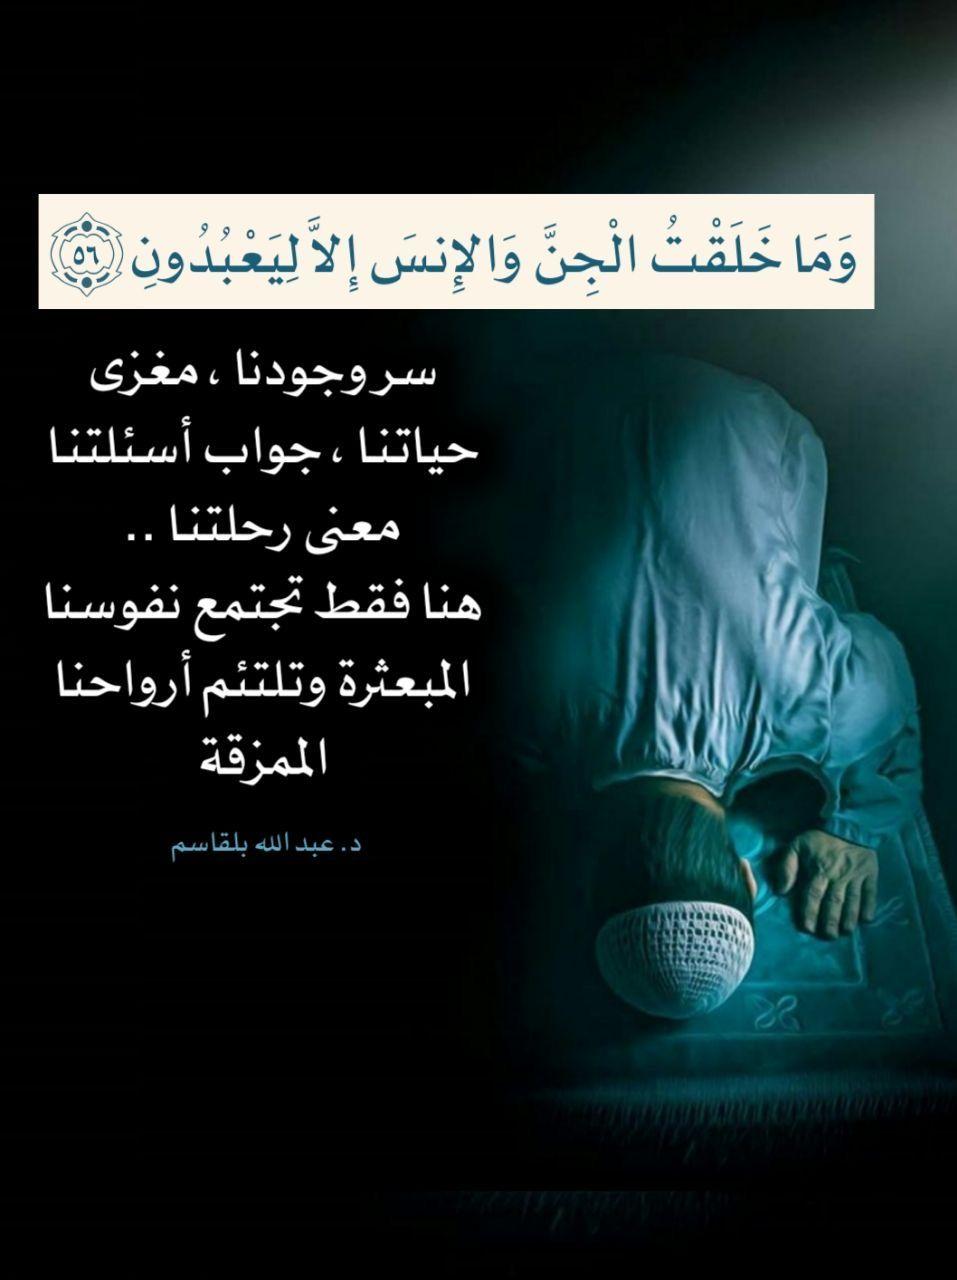 Pin By هاجر مراد On تدبرات Islamic Quotes Words Arabic Quotes